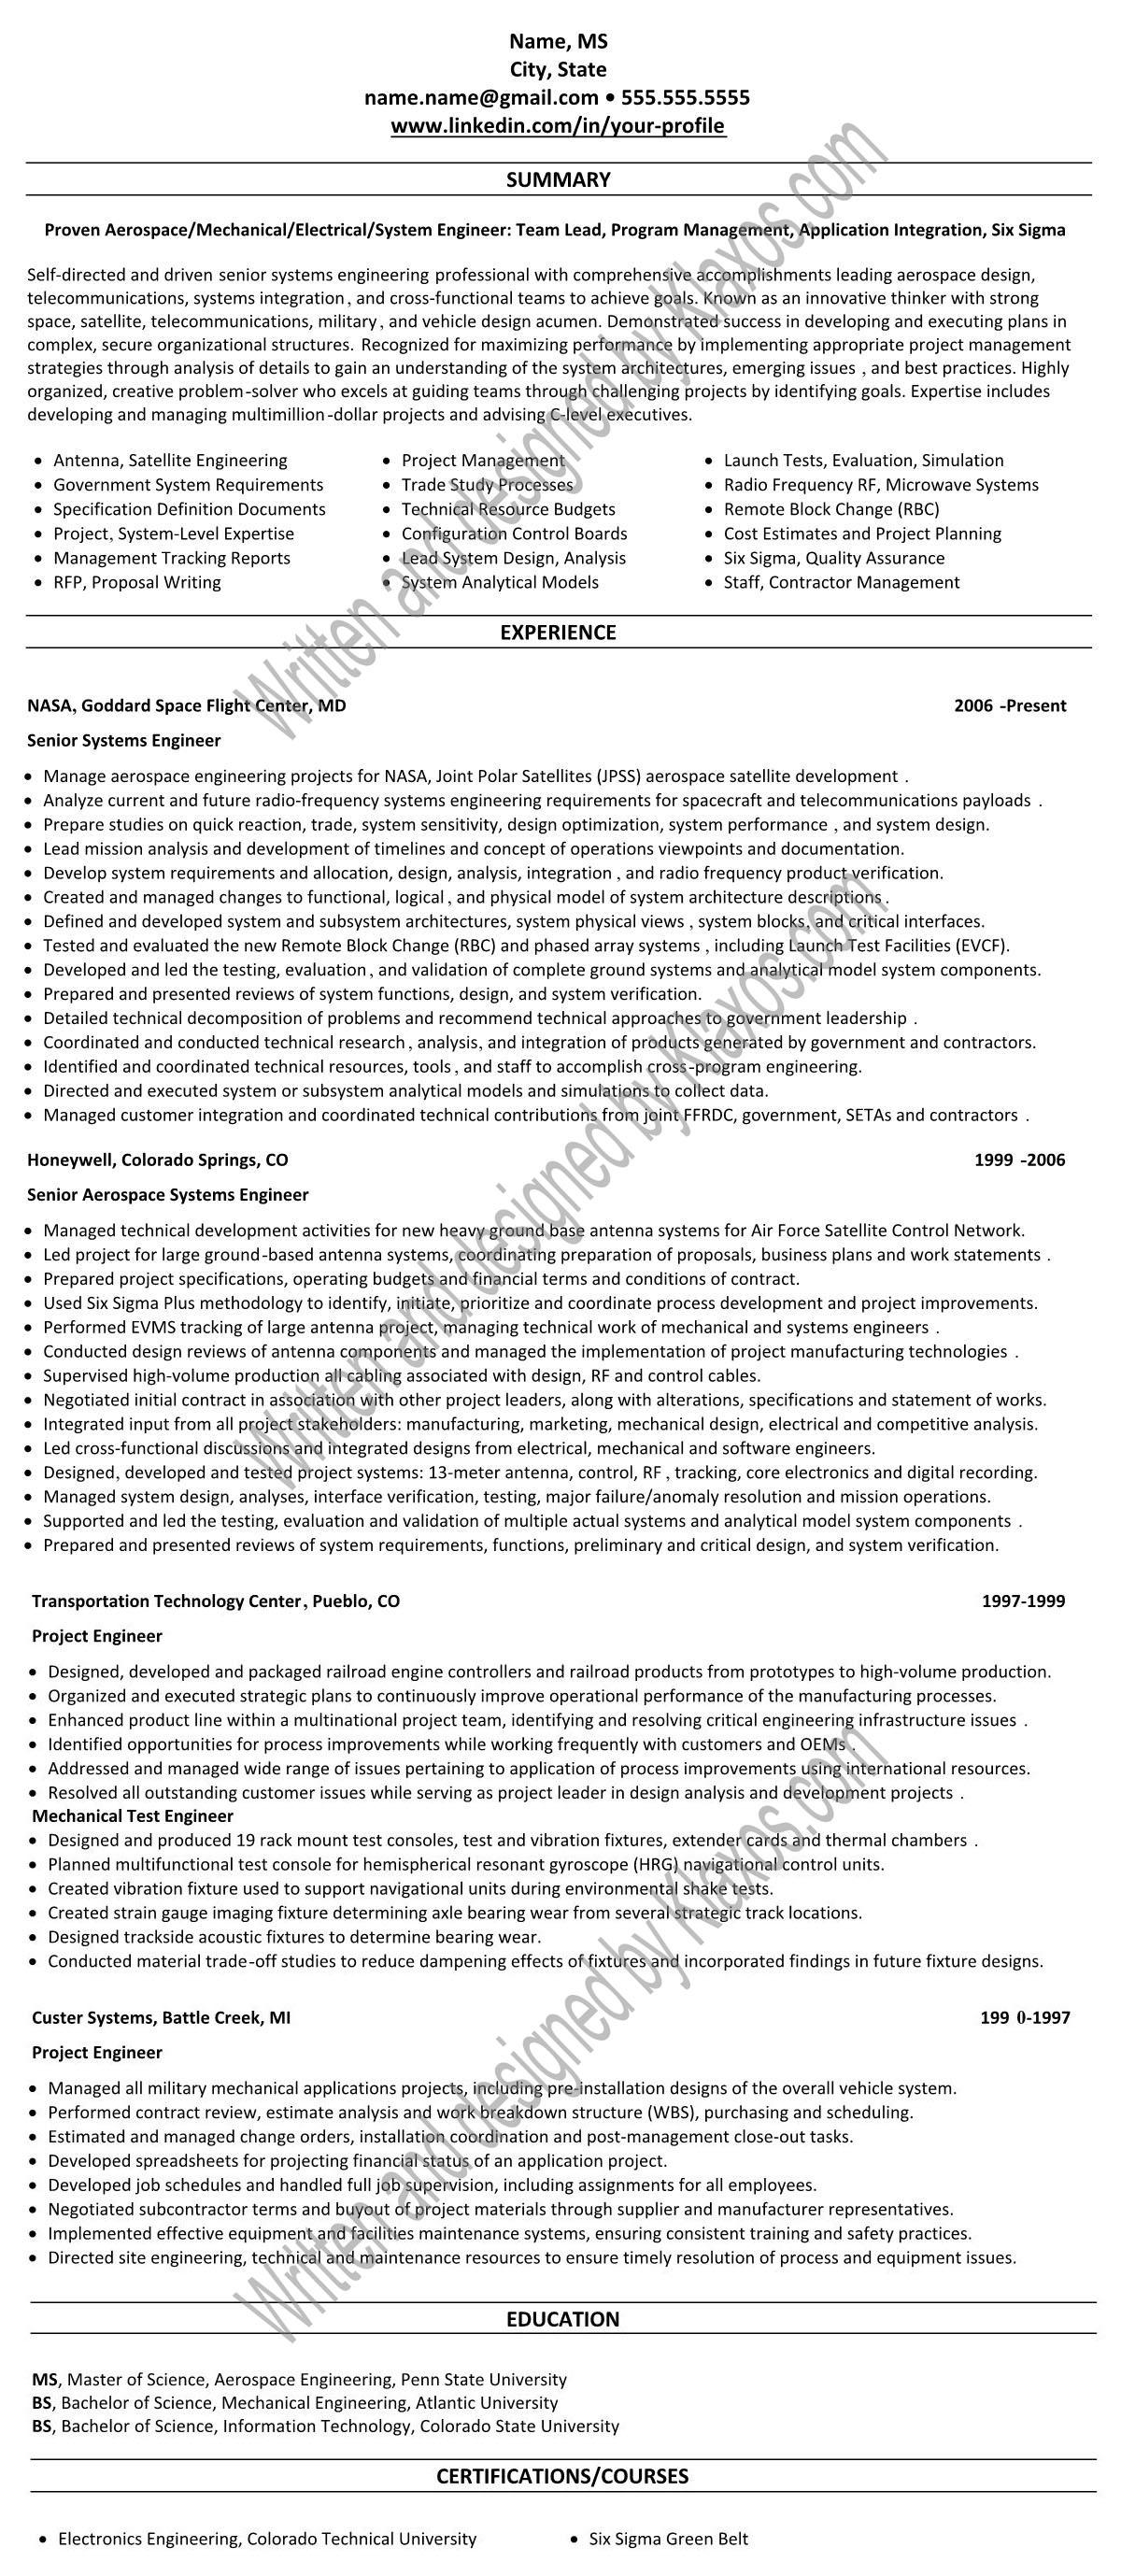 Resume 2176 200416